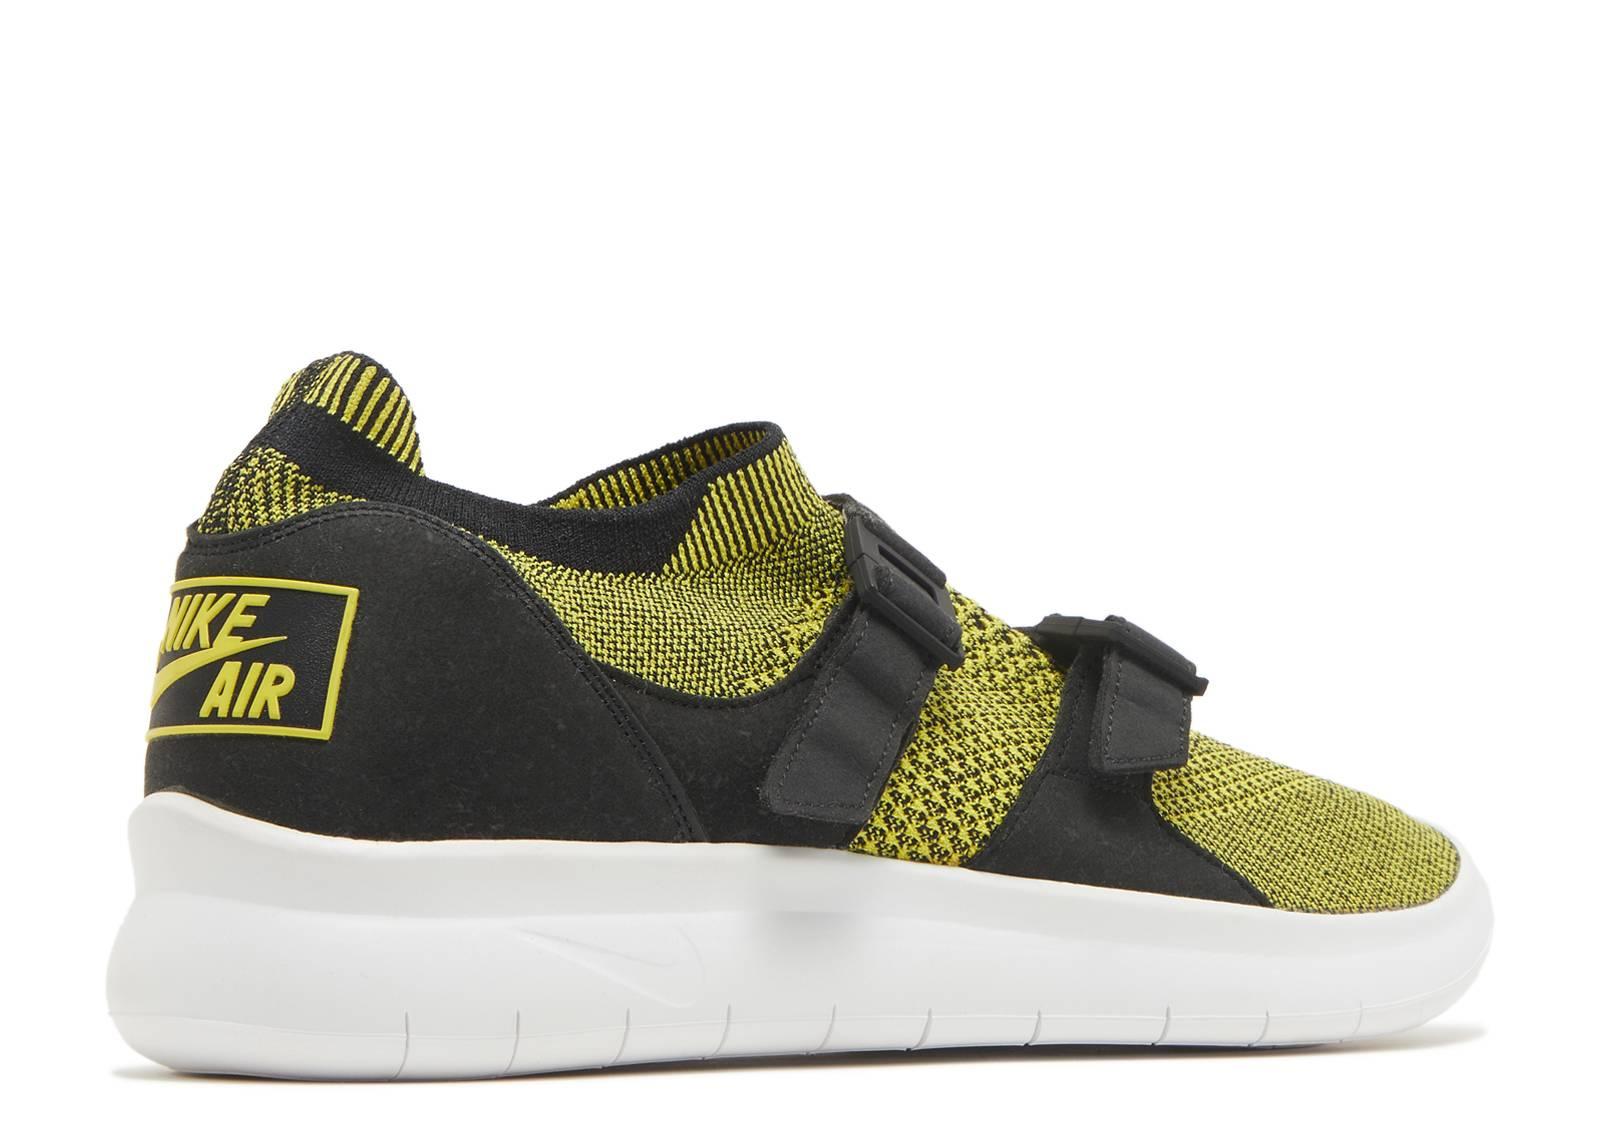 e0095b0c7276 Nike Air Sockracer Flyknit - Nike - 898022 700 - yellow strike yellow  strike